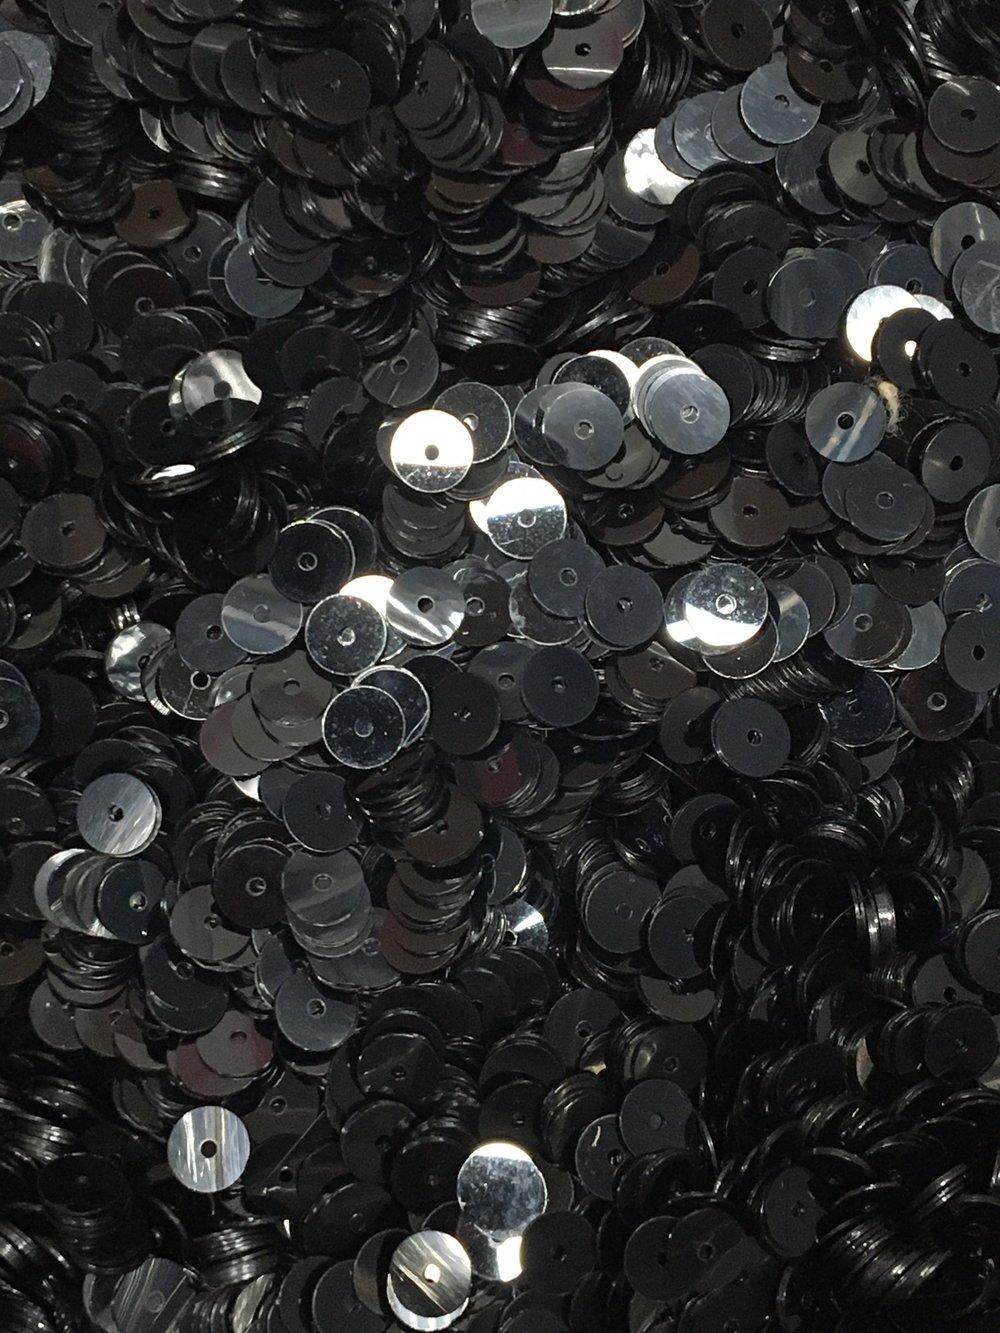 6mm Flat SequinsShiny Black - Bulk Loose Sequins (1/4 & 1/2 Pound)